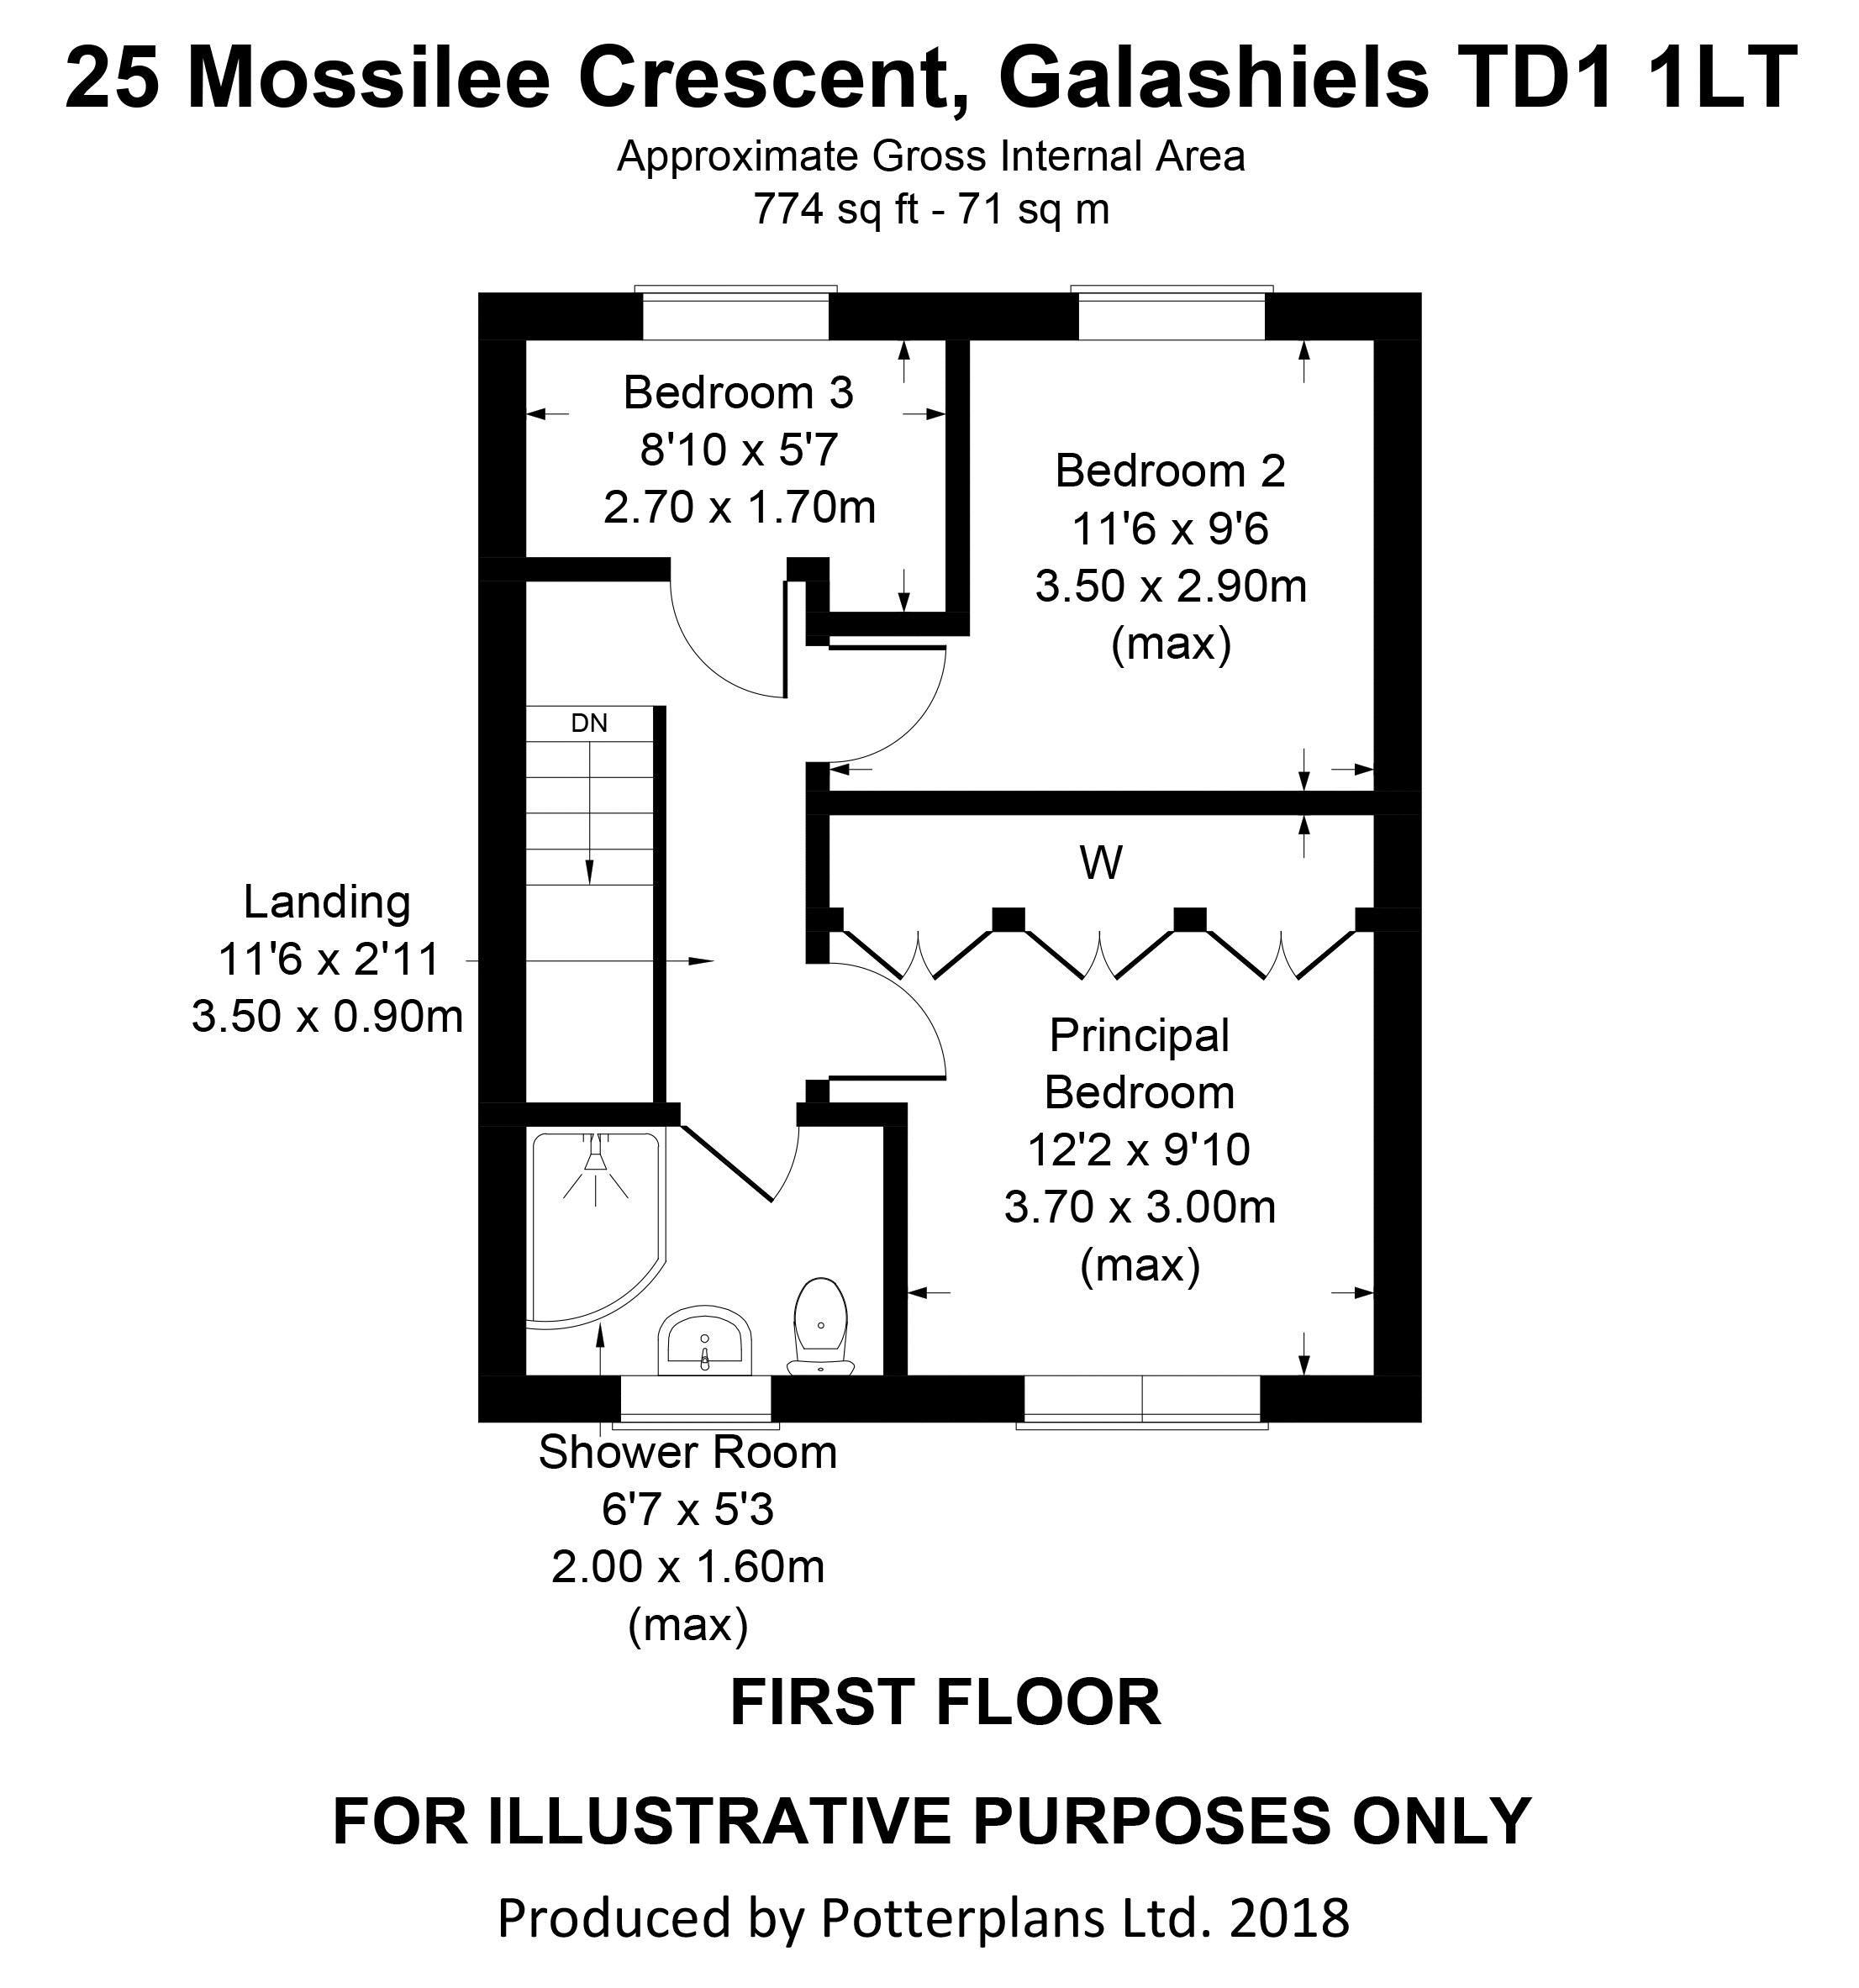 25 Mossilee Crescent First Floor